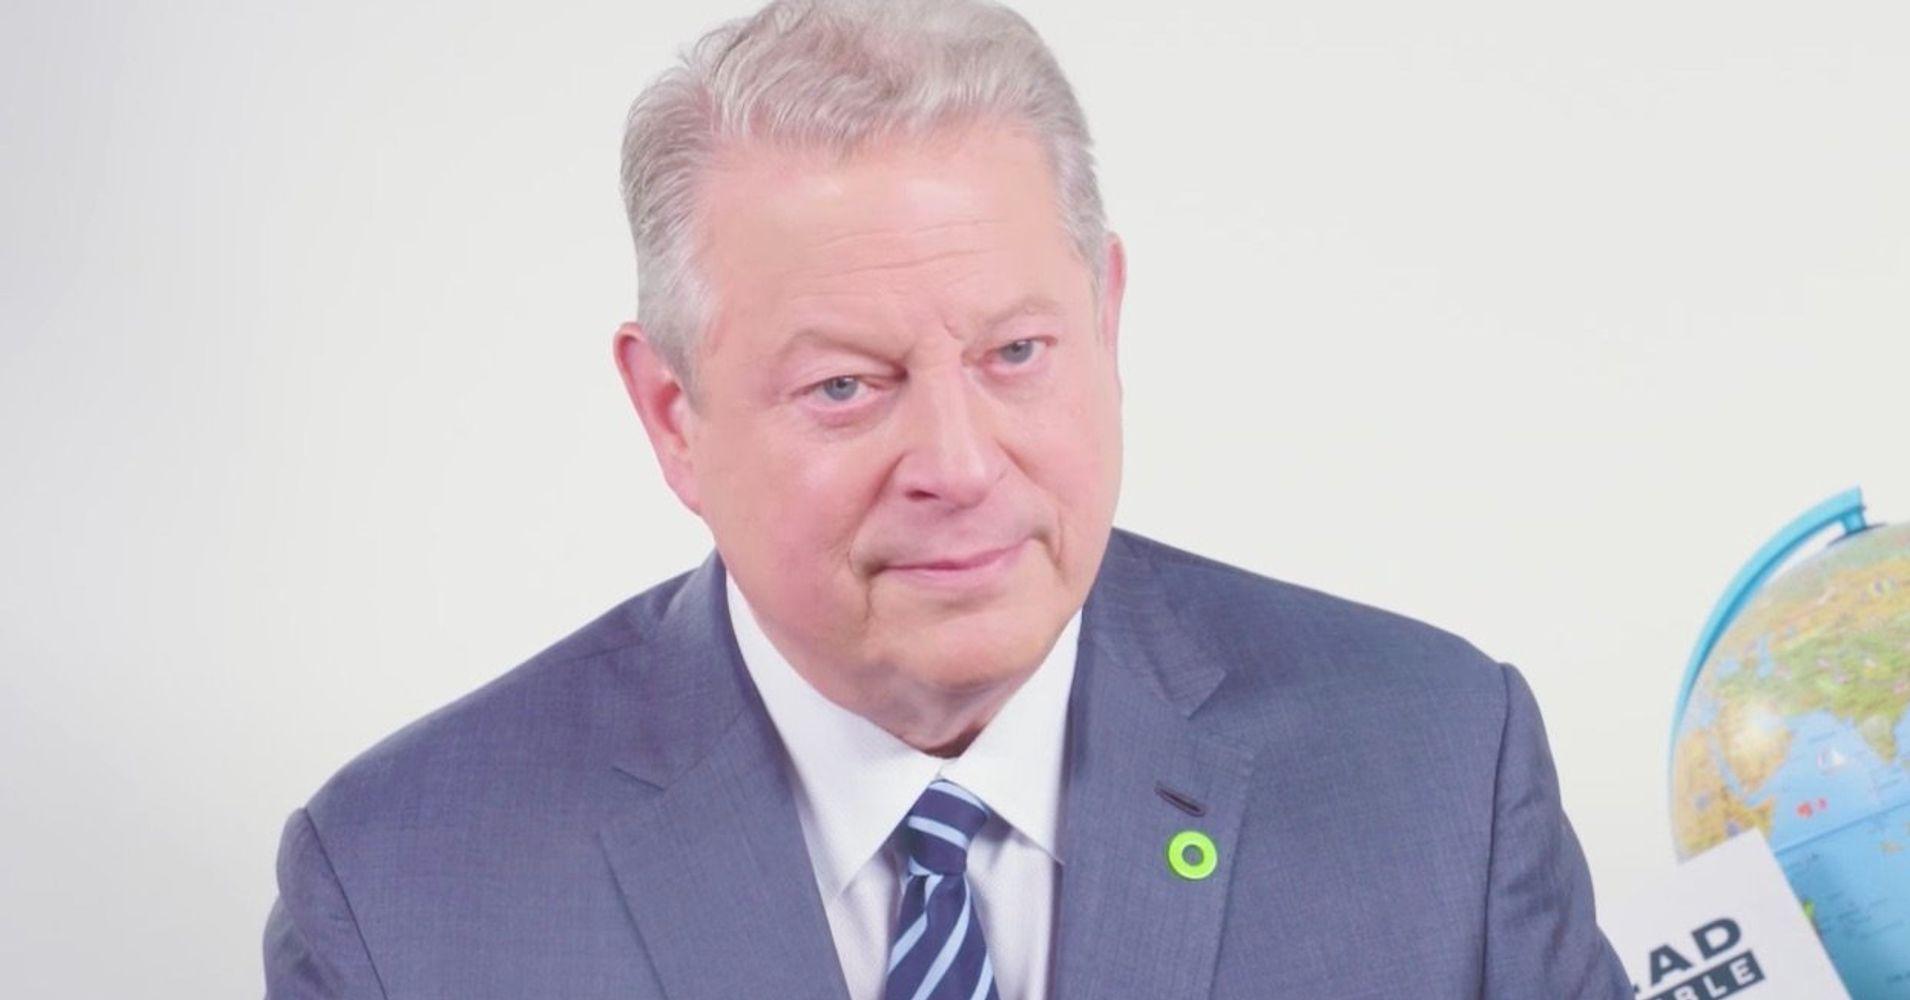 Al Gore Calls On Donald Trump To Resign